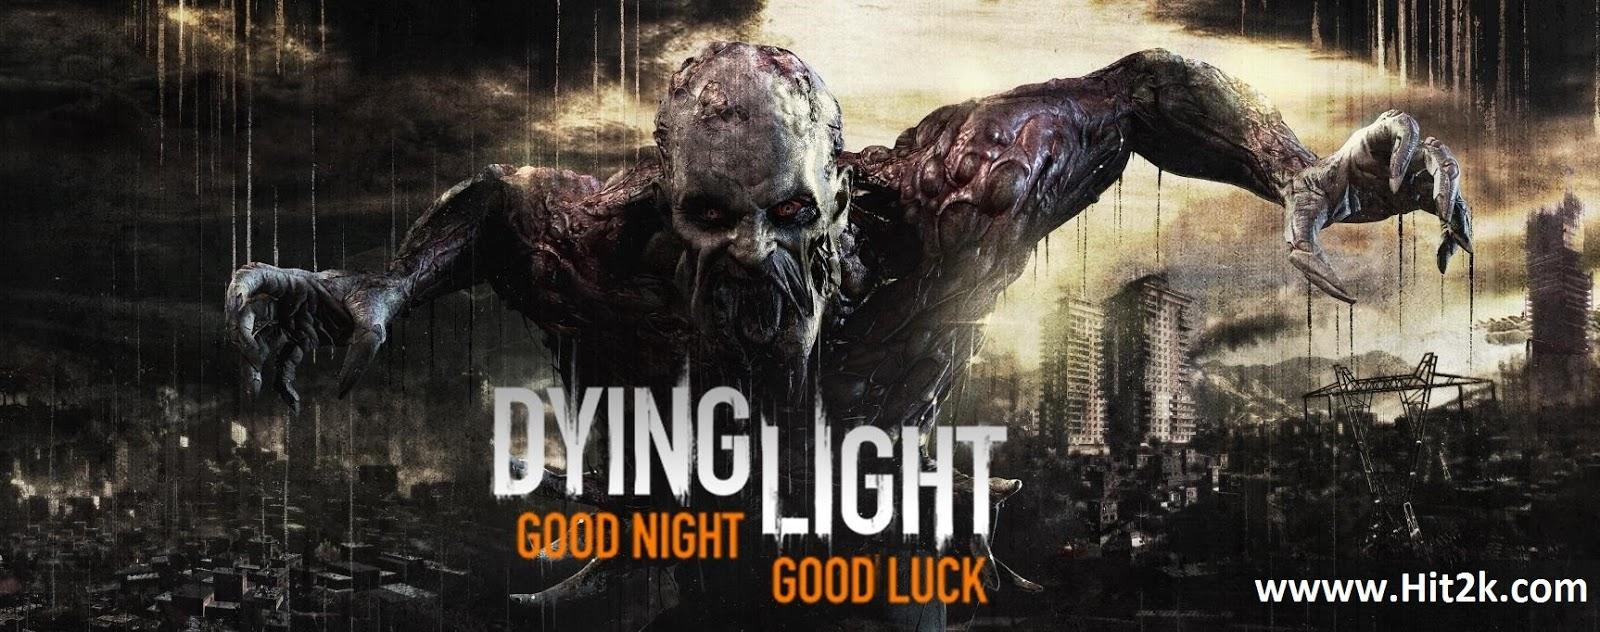 Dying Light Full Repack + DLC Latest Is Here